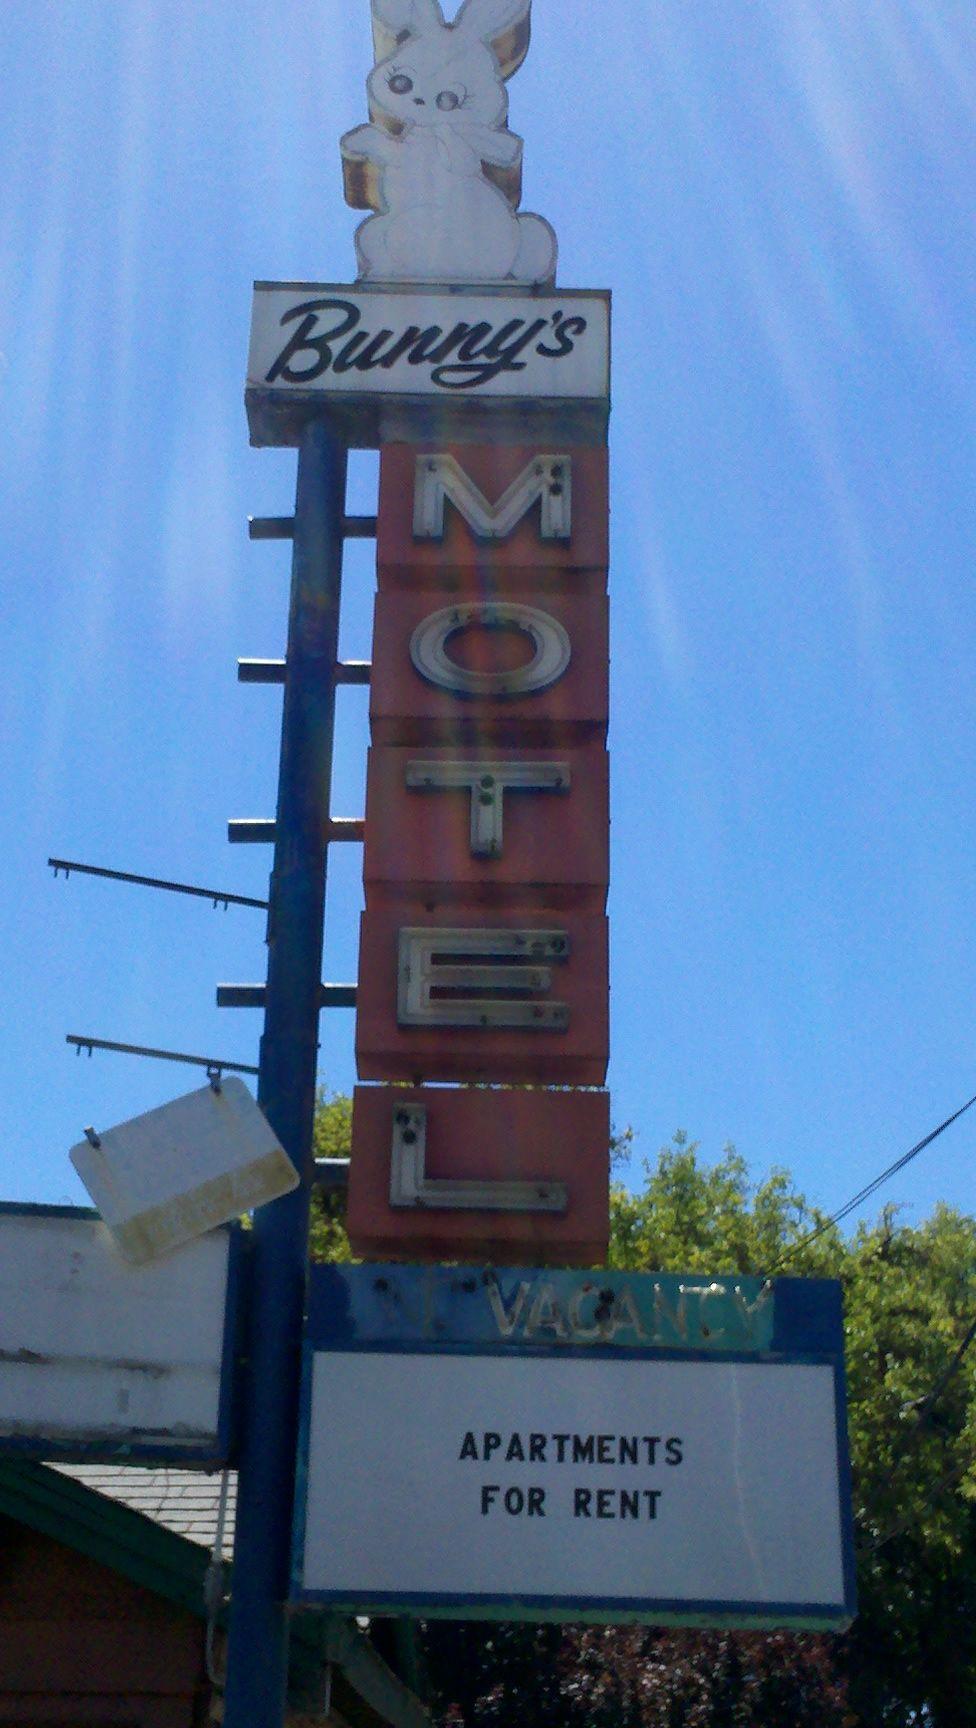 Bunnys motel in grants pass oregon just opposite the flamingo inn july 2013